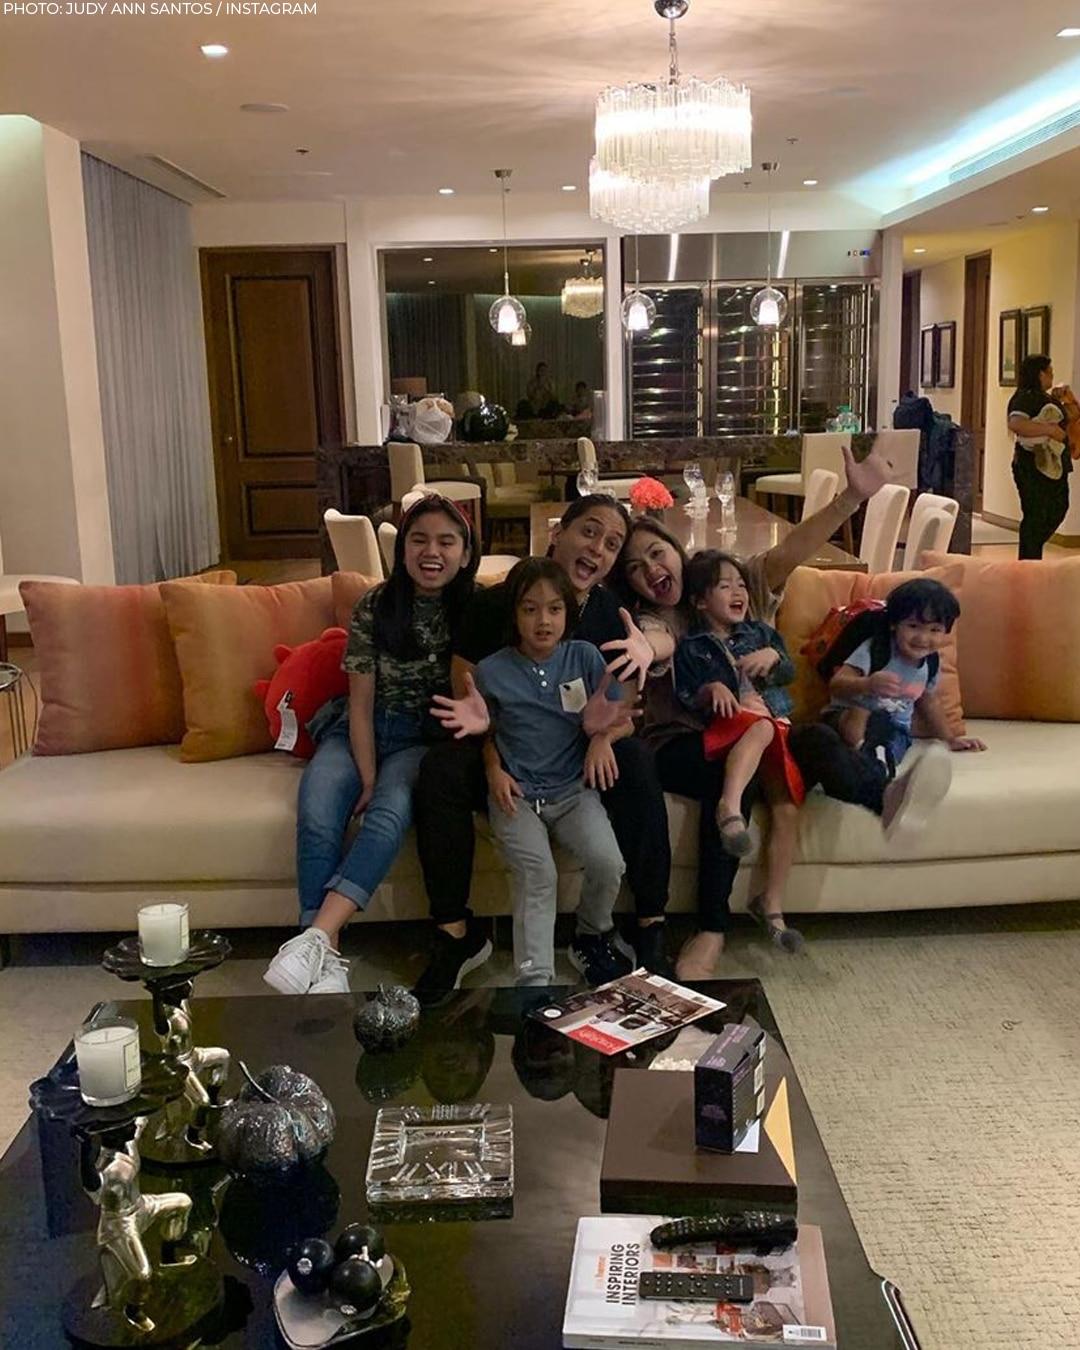 The beautiful Agoncillo family